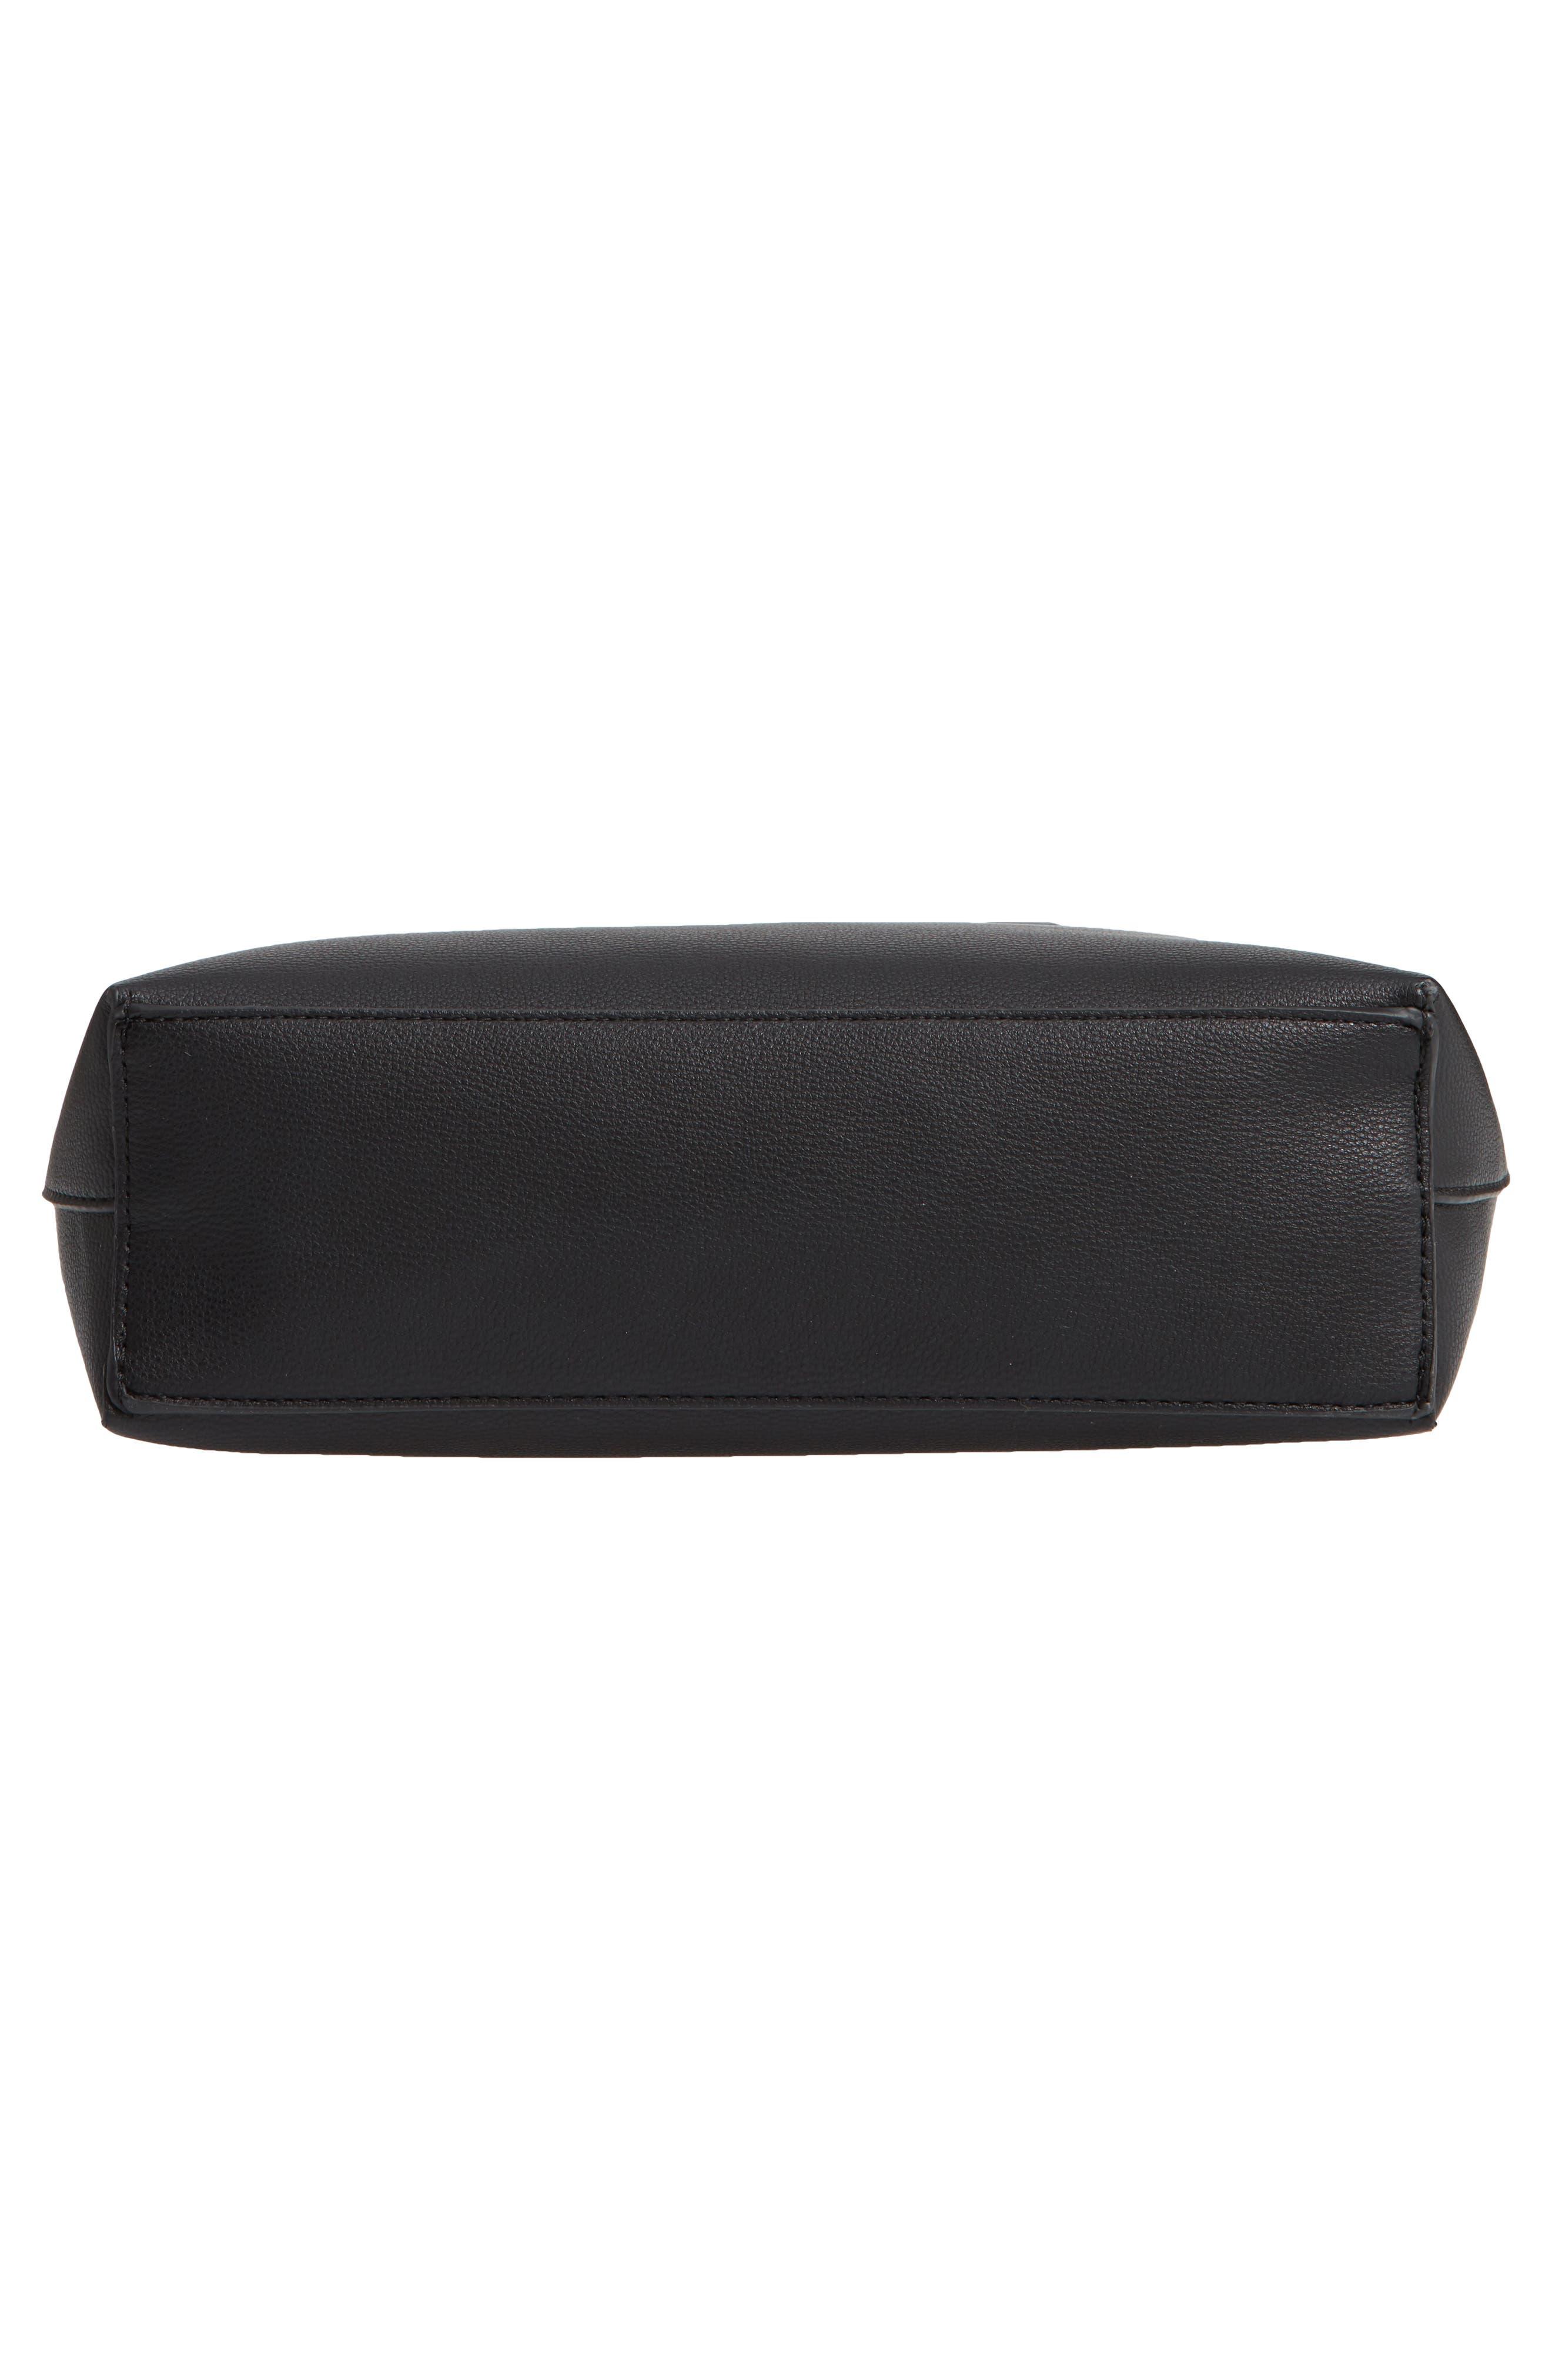 CHELSEA28, Payton Convertible Faux Leather Tote, Alternate thumbnail 7, color, BLACK